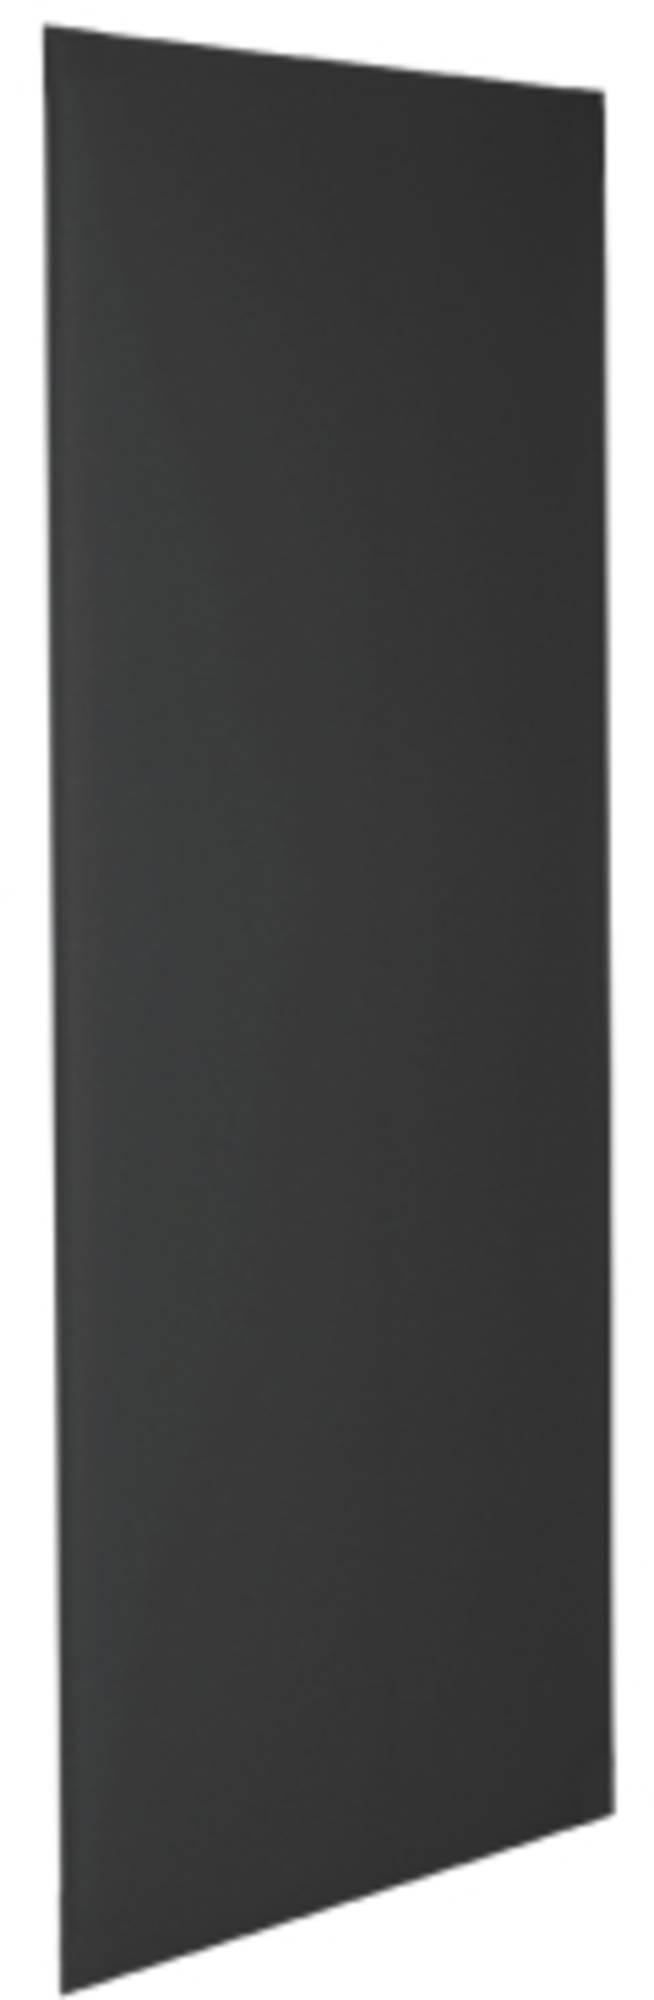 Geesa spectra plaat los v-urinoirscherm, zwart